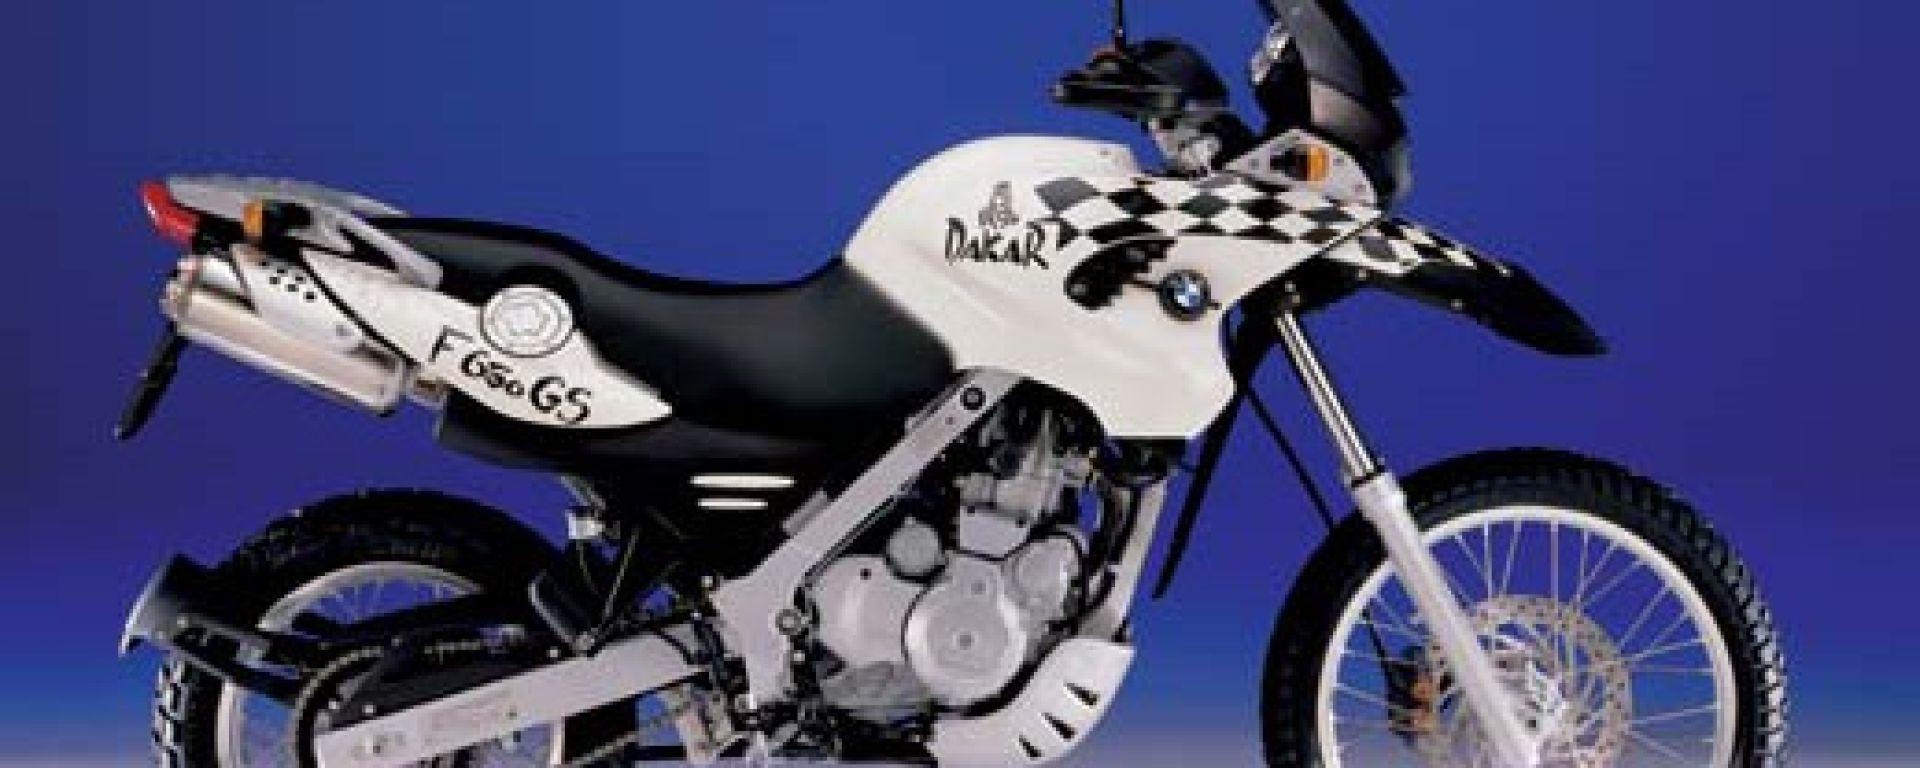 Long Term Test Bmw F650gs Dakar Motorbox